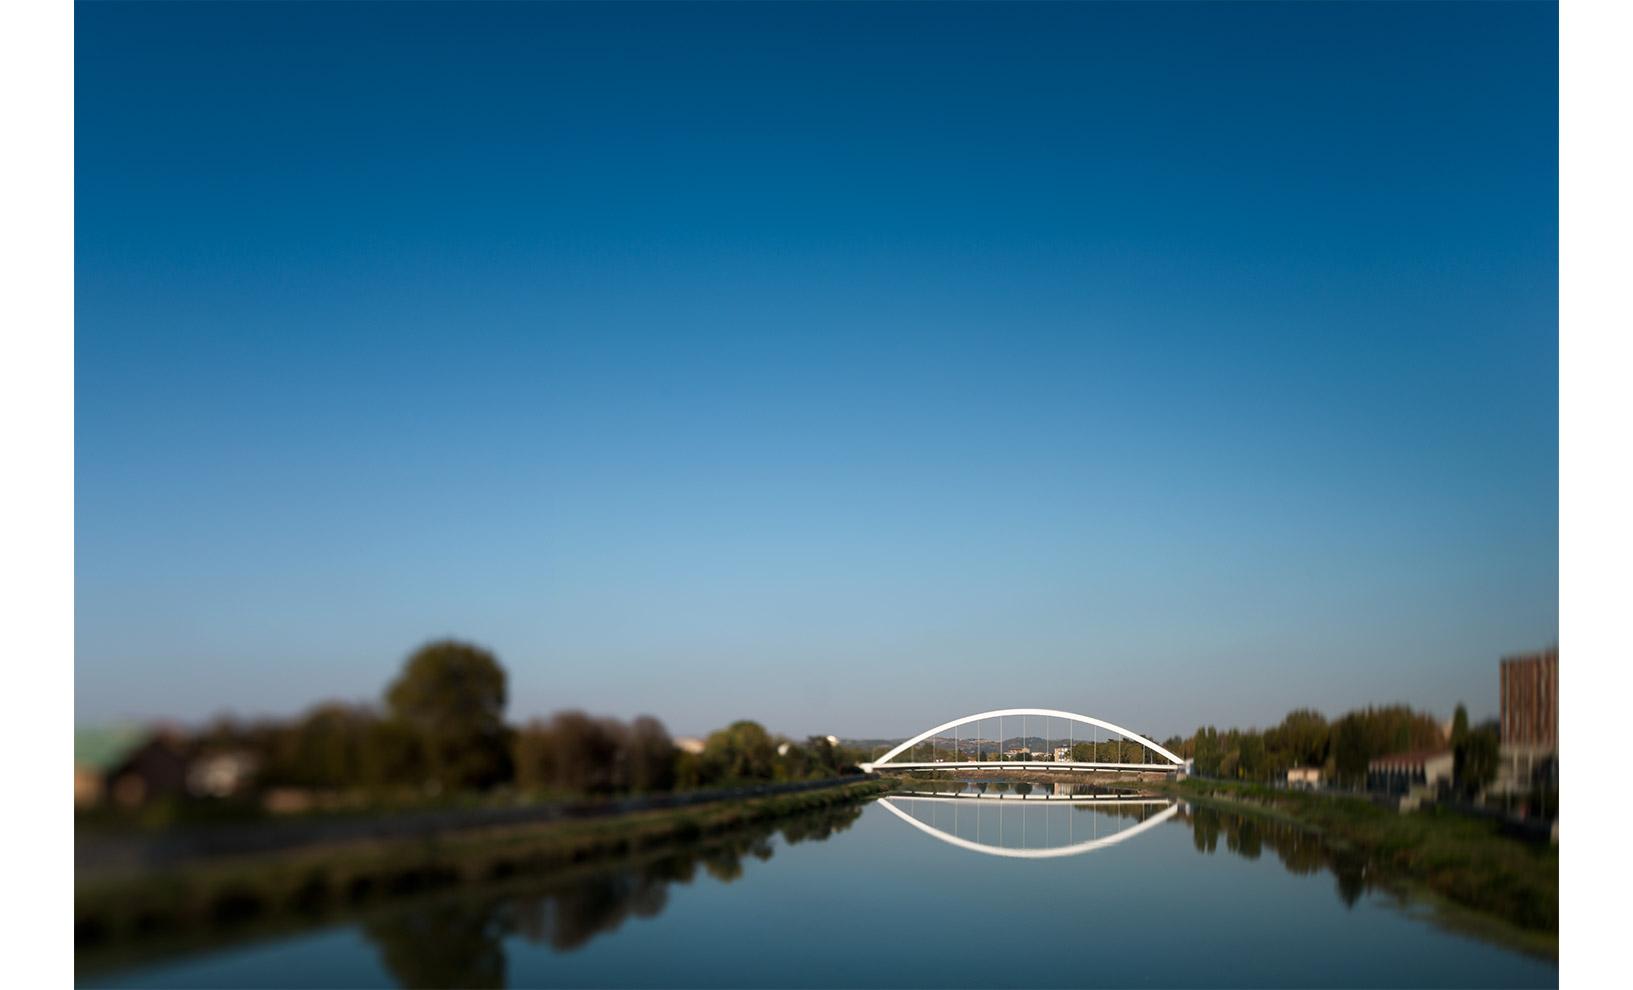 ©marco-tacchini-fotografo-ponte-cittadella-richar-meier-and-partners_04